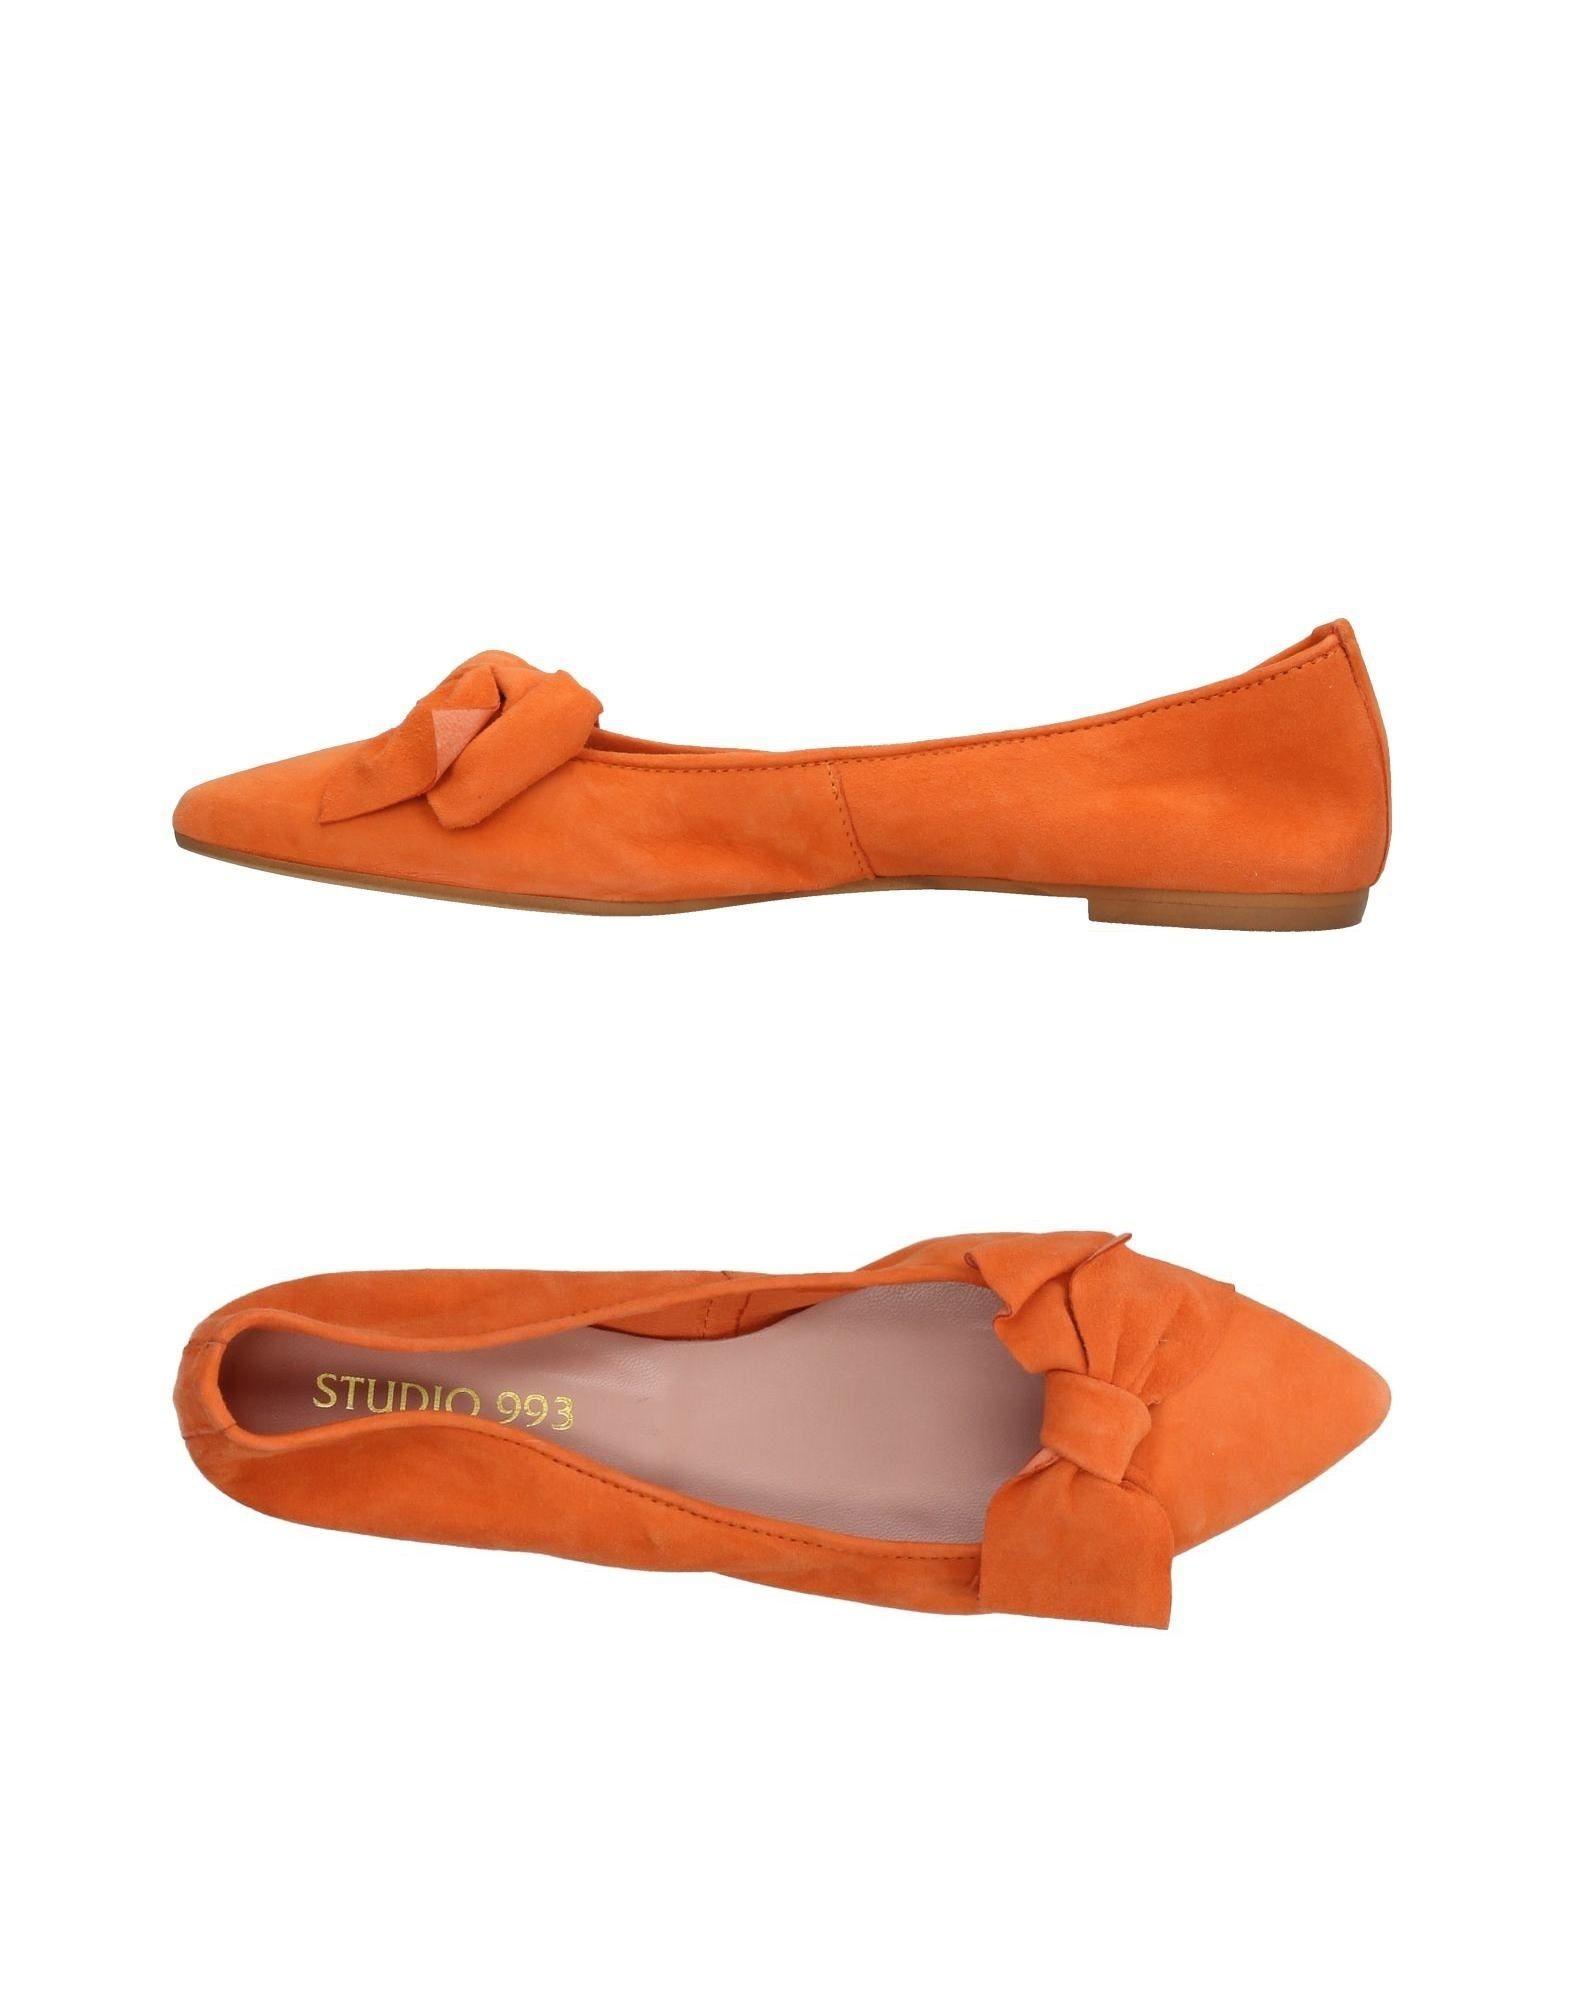 Studio 993 Ballerinas Damen  11401121NP Gute Qualität beliebte Schuhe